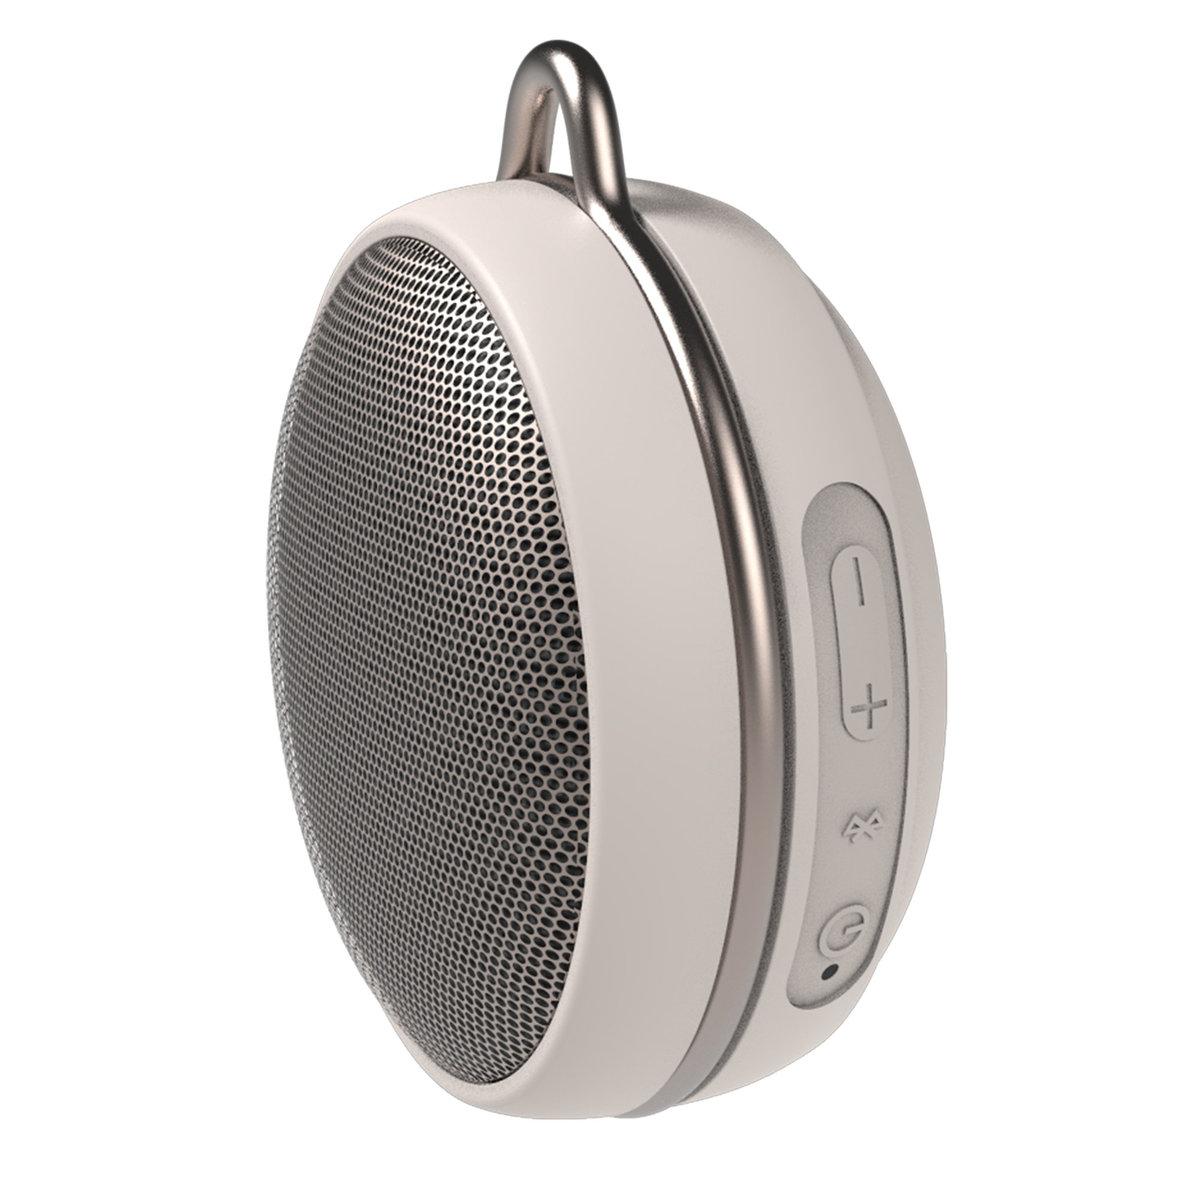 MACARON Mini Waterproof Bluetooth Speaker - Pearl White - True Wireless Stereo Bluetooth Speaker